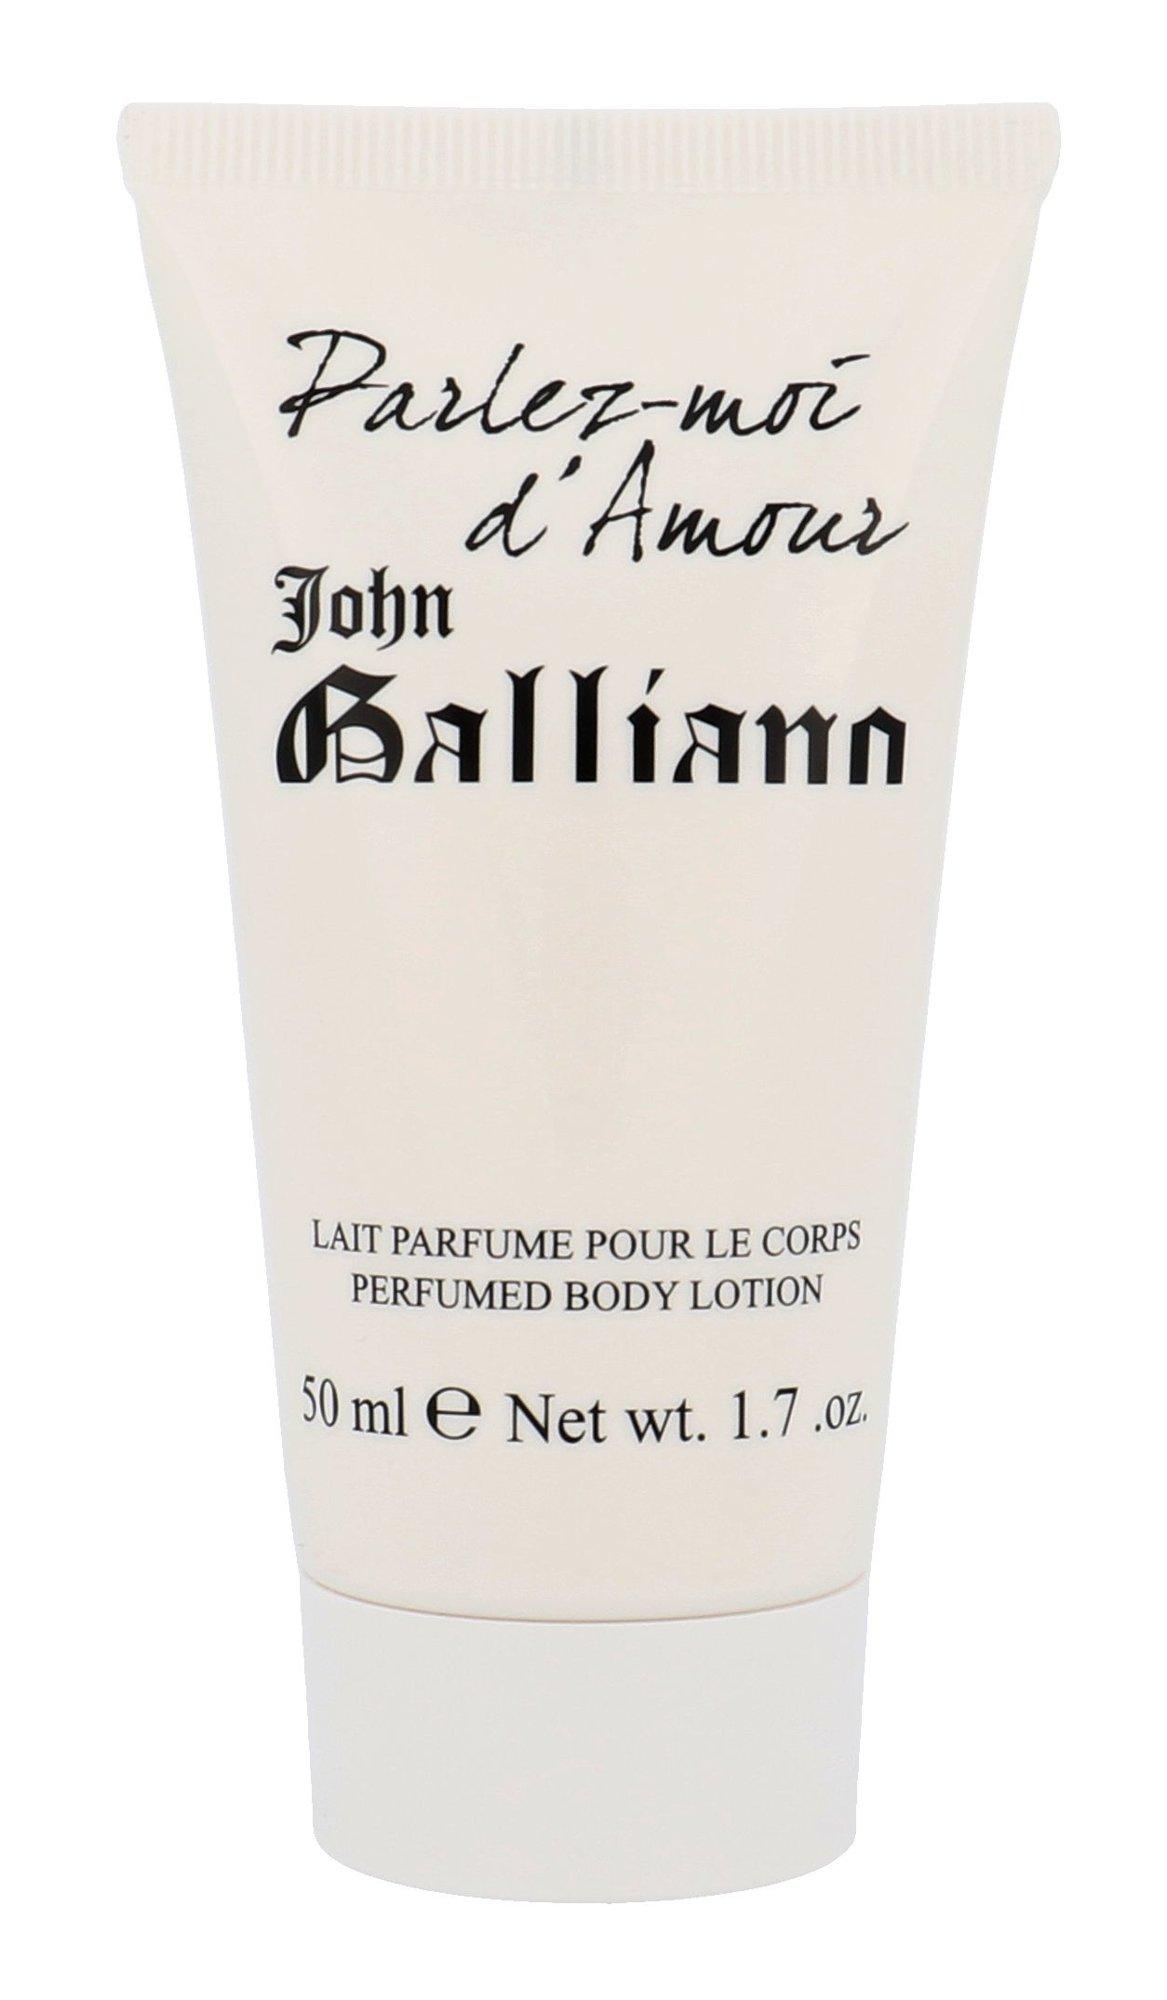 John Galliano Parlez-Moi d´Amour Body lotion 50ml